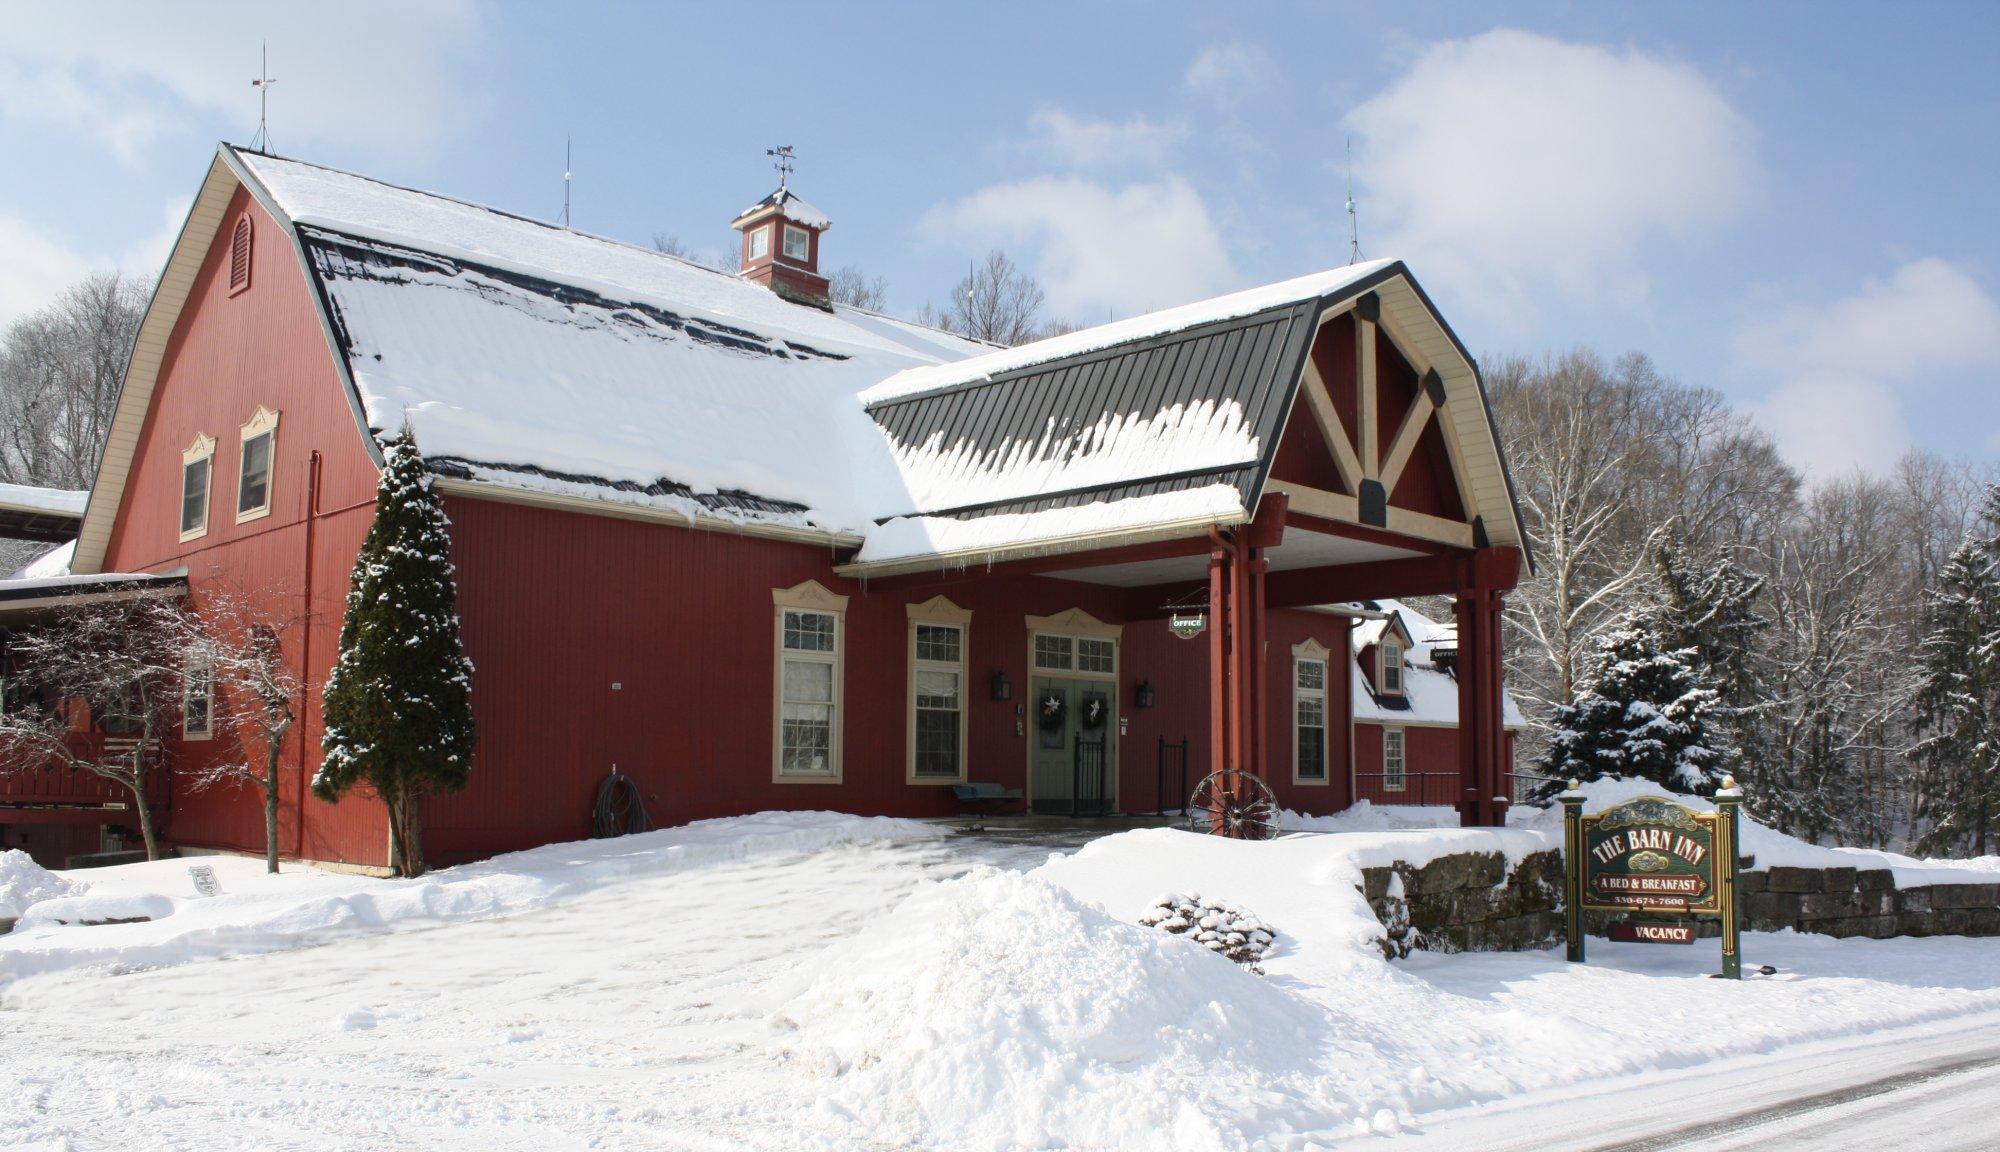 A house covered in snow at Barn Inn.